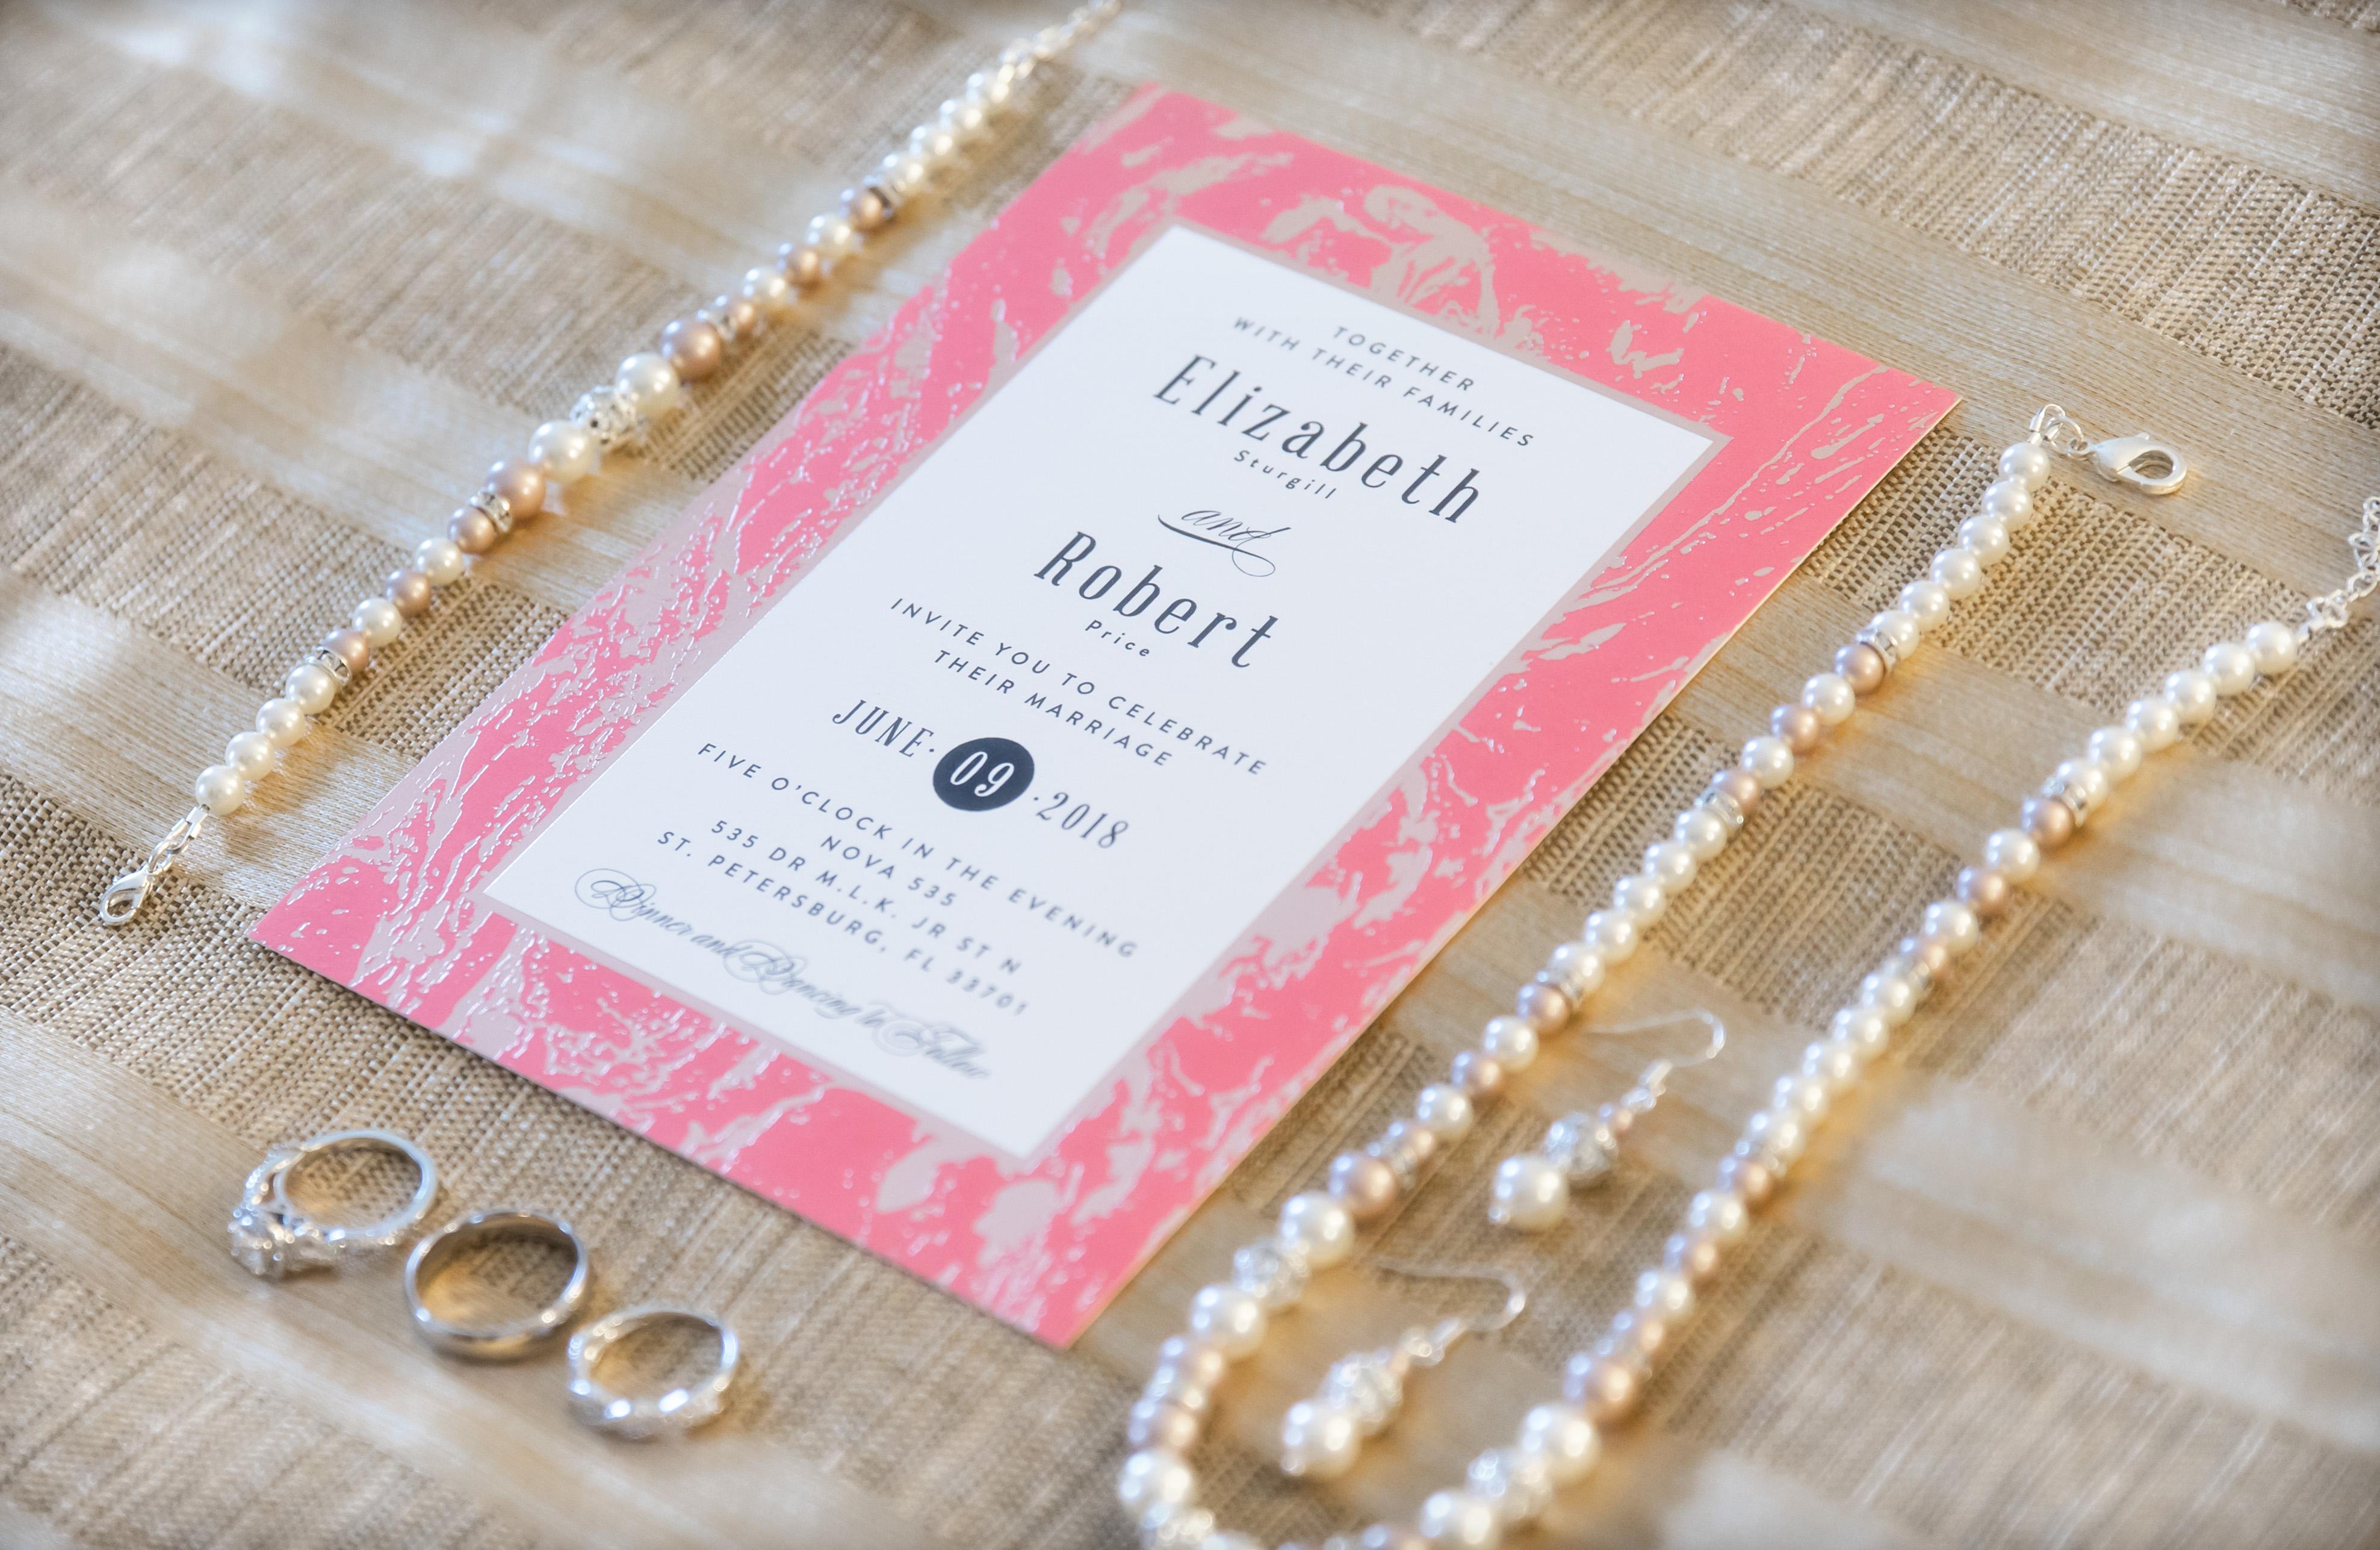 Pink printed wedding invitation for Vintage St Petersburg Wedding   Downtown St. Pete Venue NOVA 535